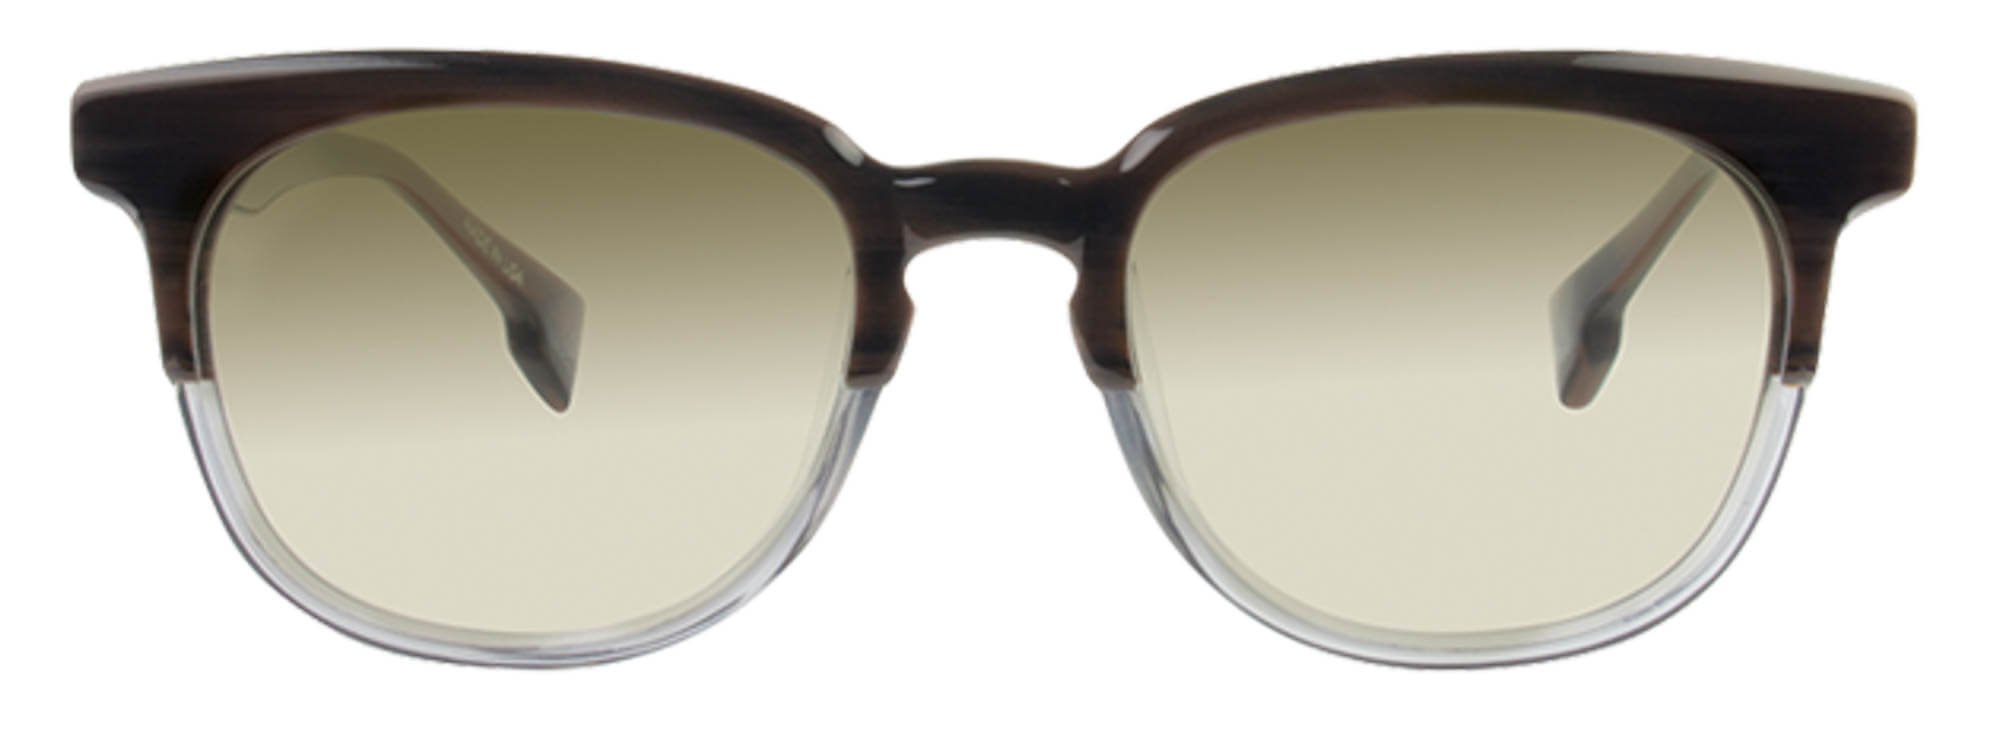 Clubmaster Sunglasses Price  clubmaster sunglasses browline style primer gentleman s gazette